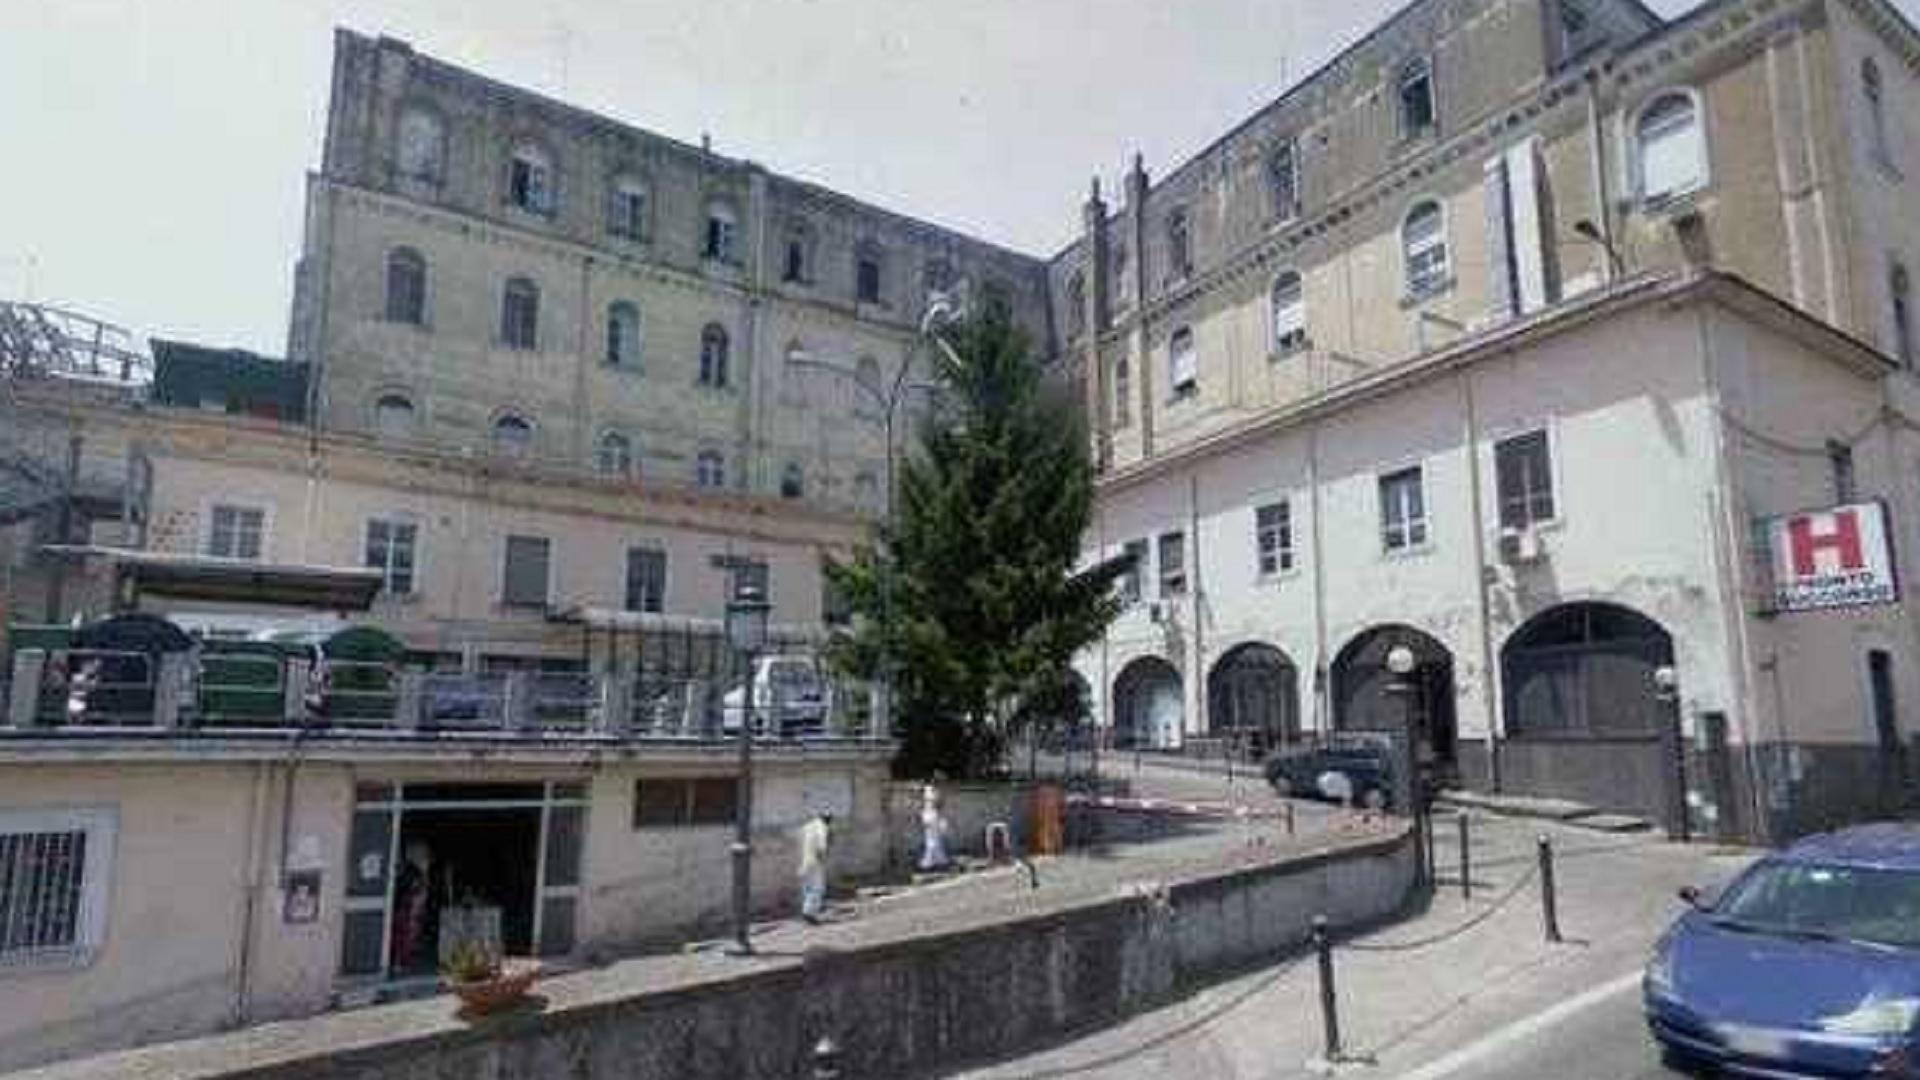 ospedale cava de tirreni